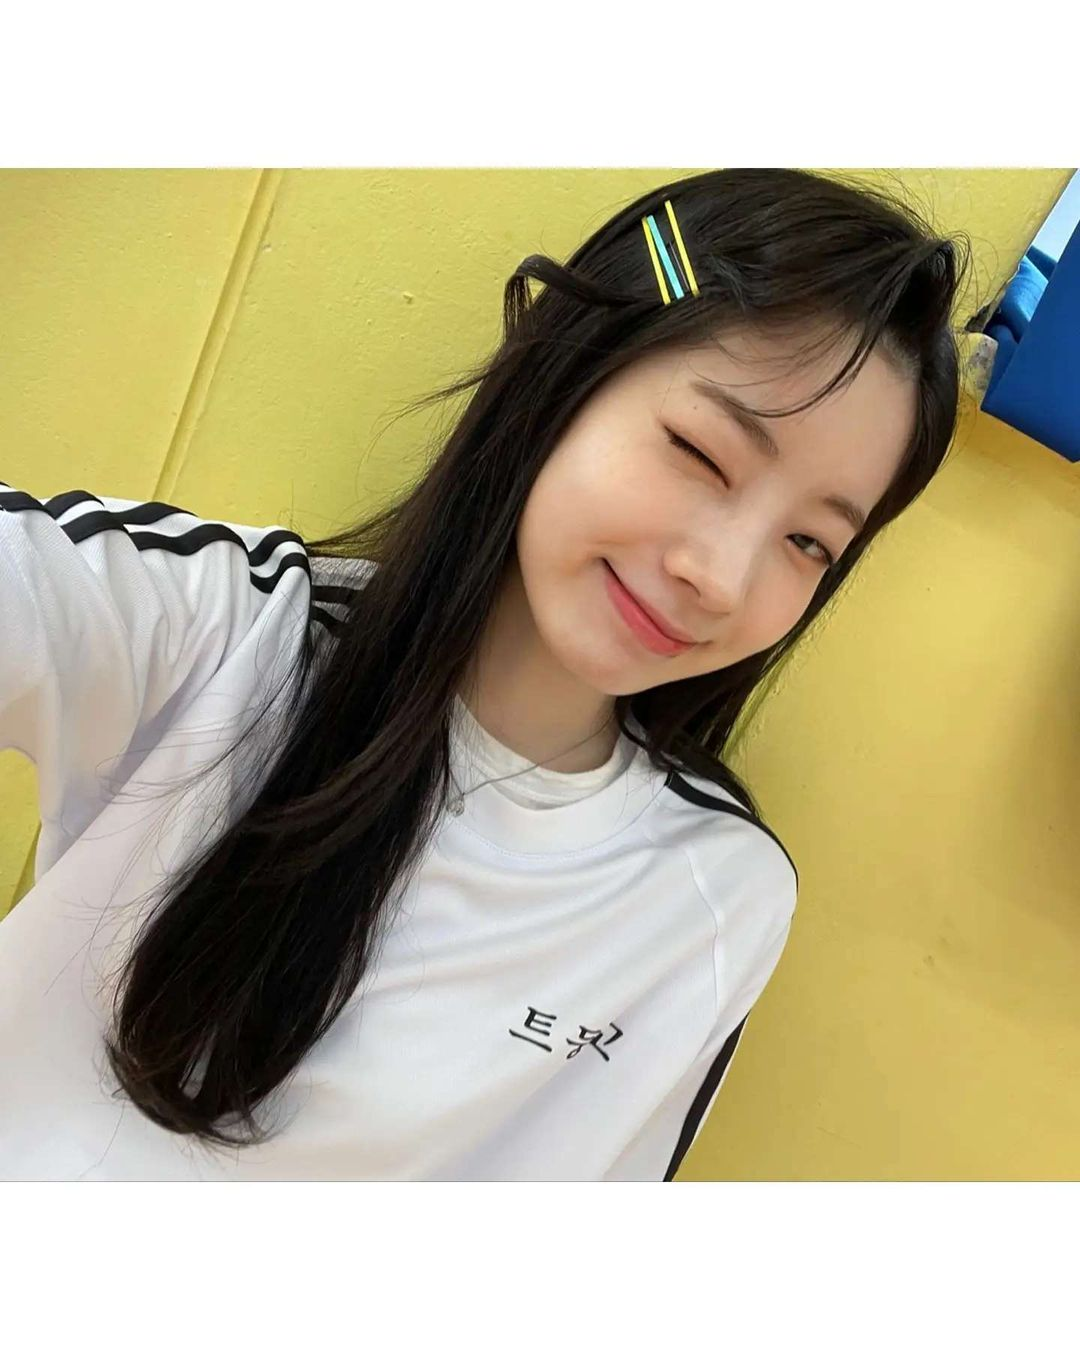 TWICE Dahyun, fresh visual like a high school student